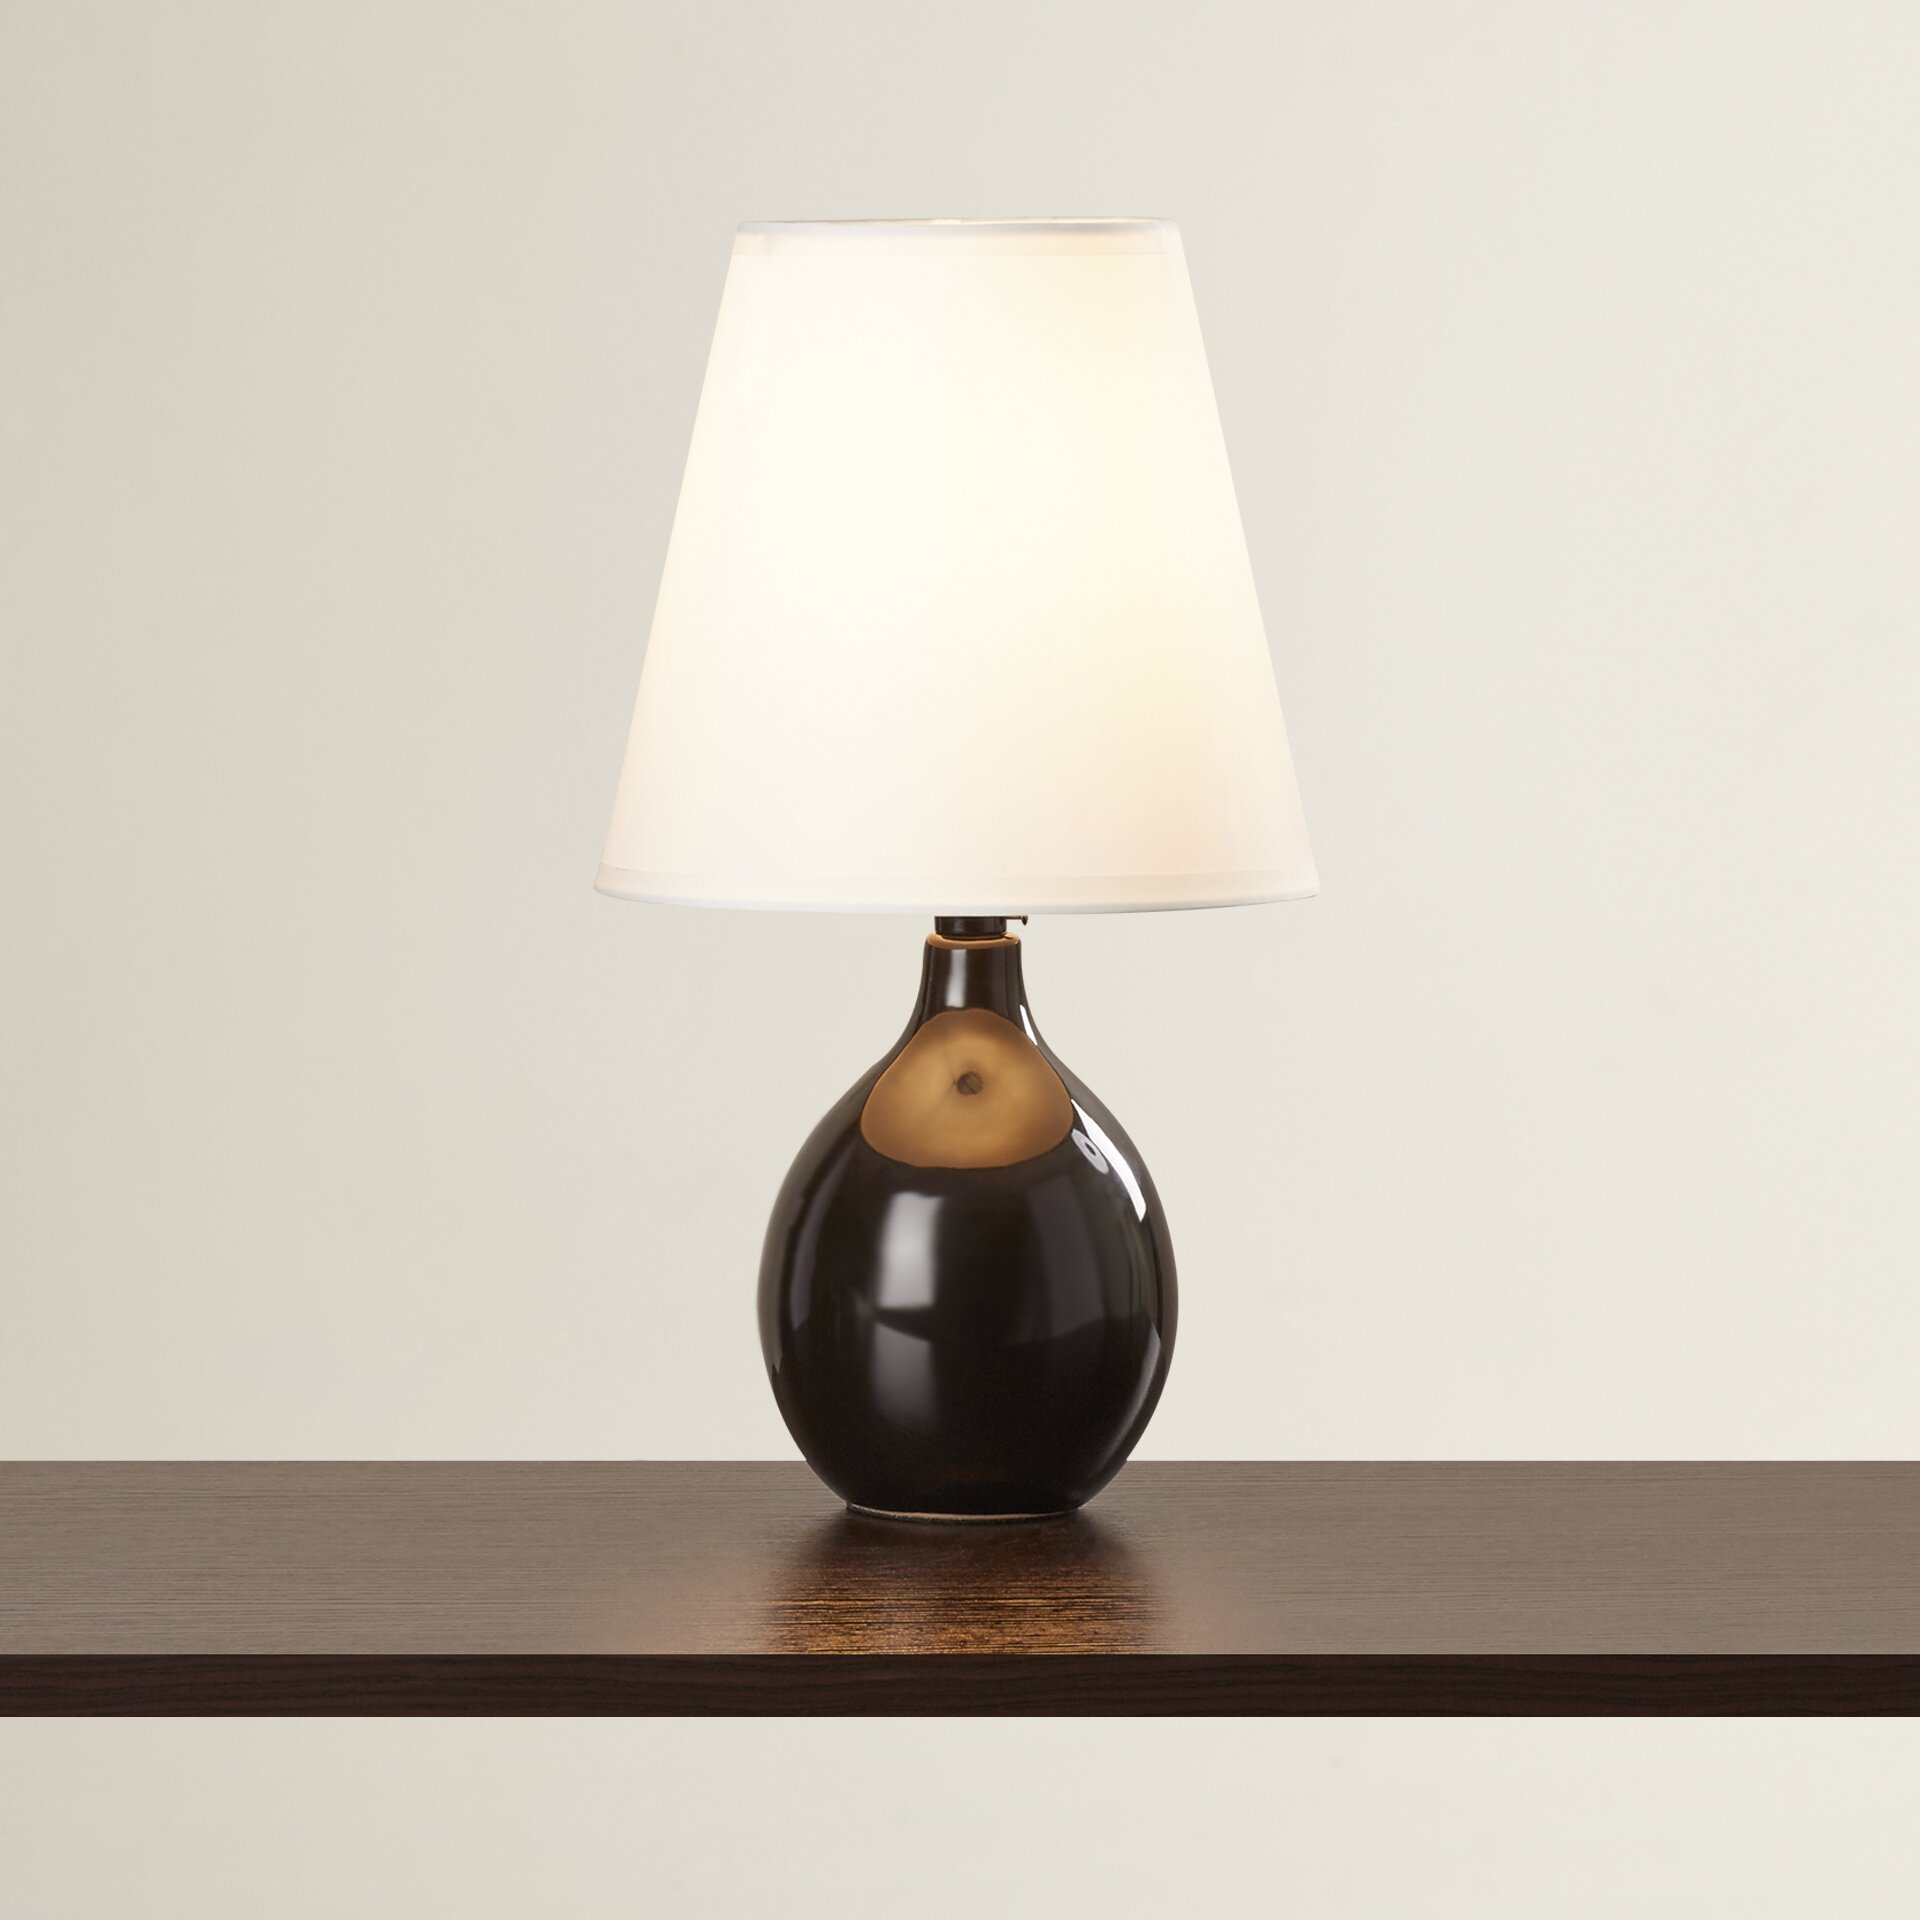 lighting lamps black table lamps viv rae sku vvro2828. Black Bedroom Furniture Sets. Home Design Ideas